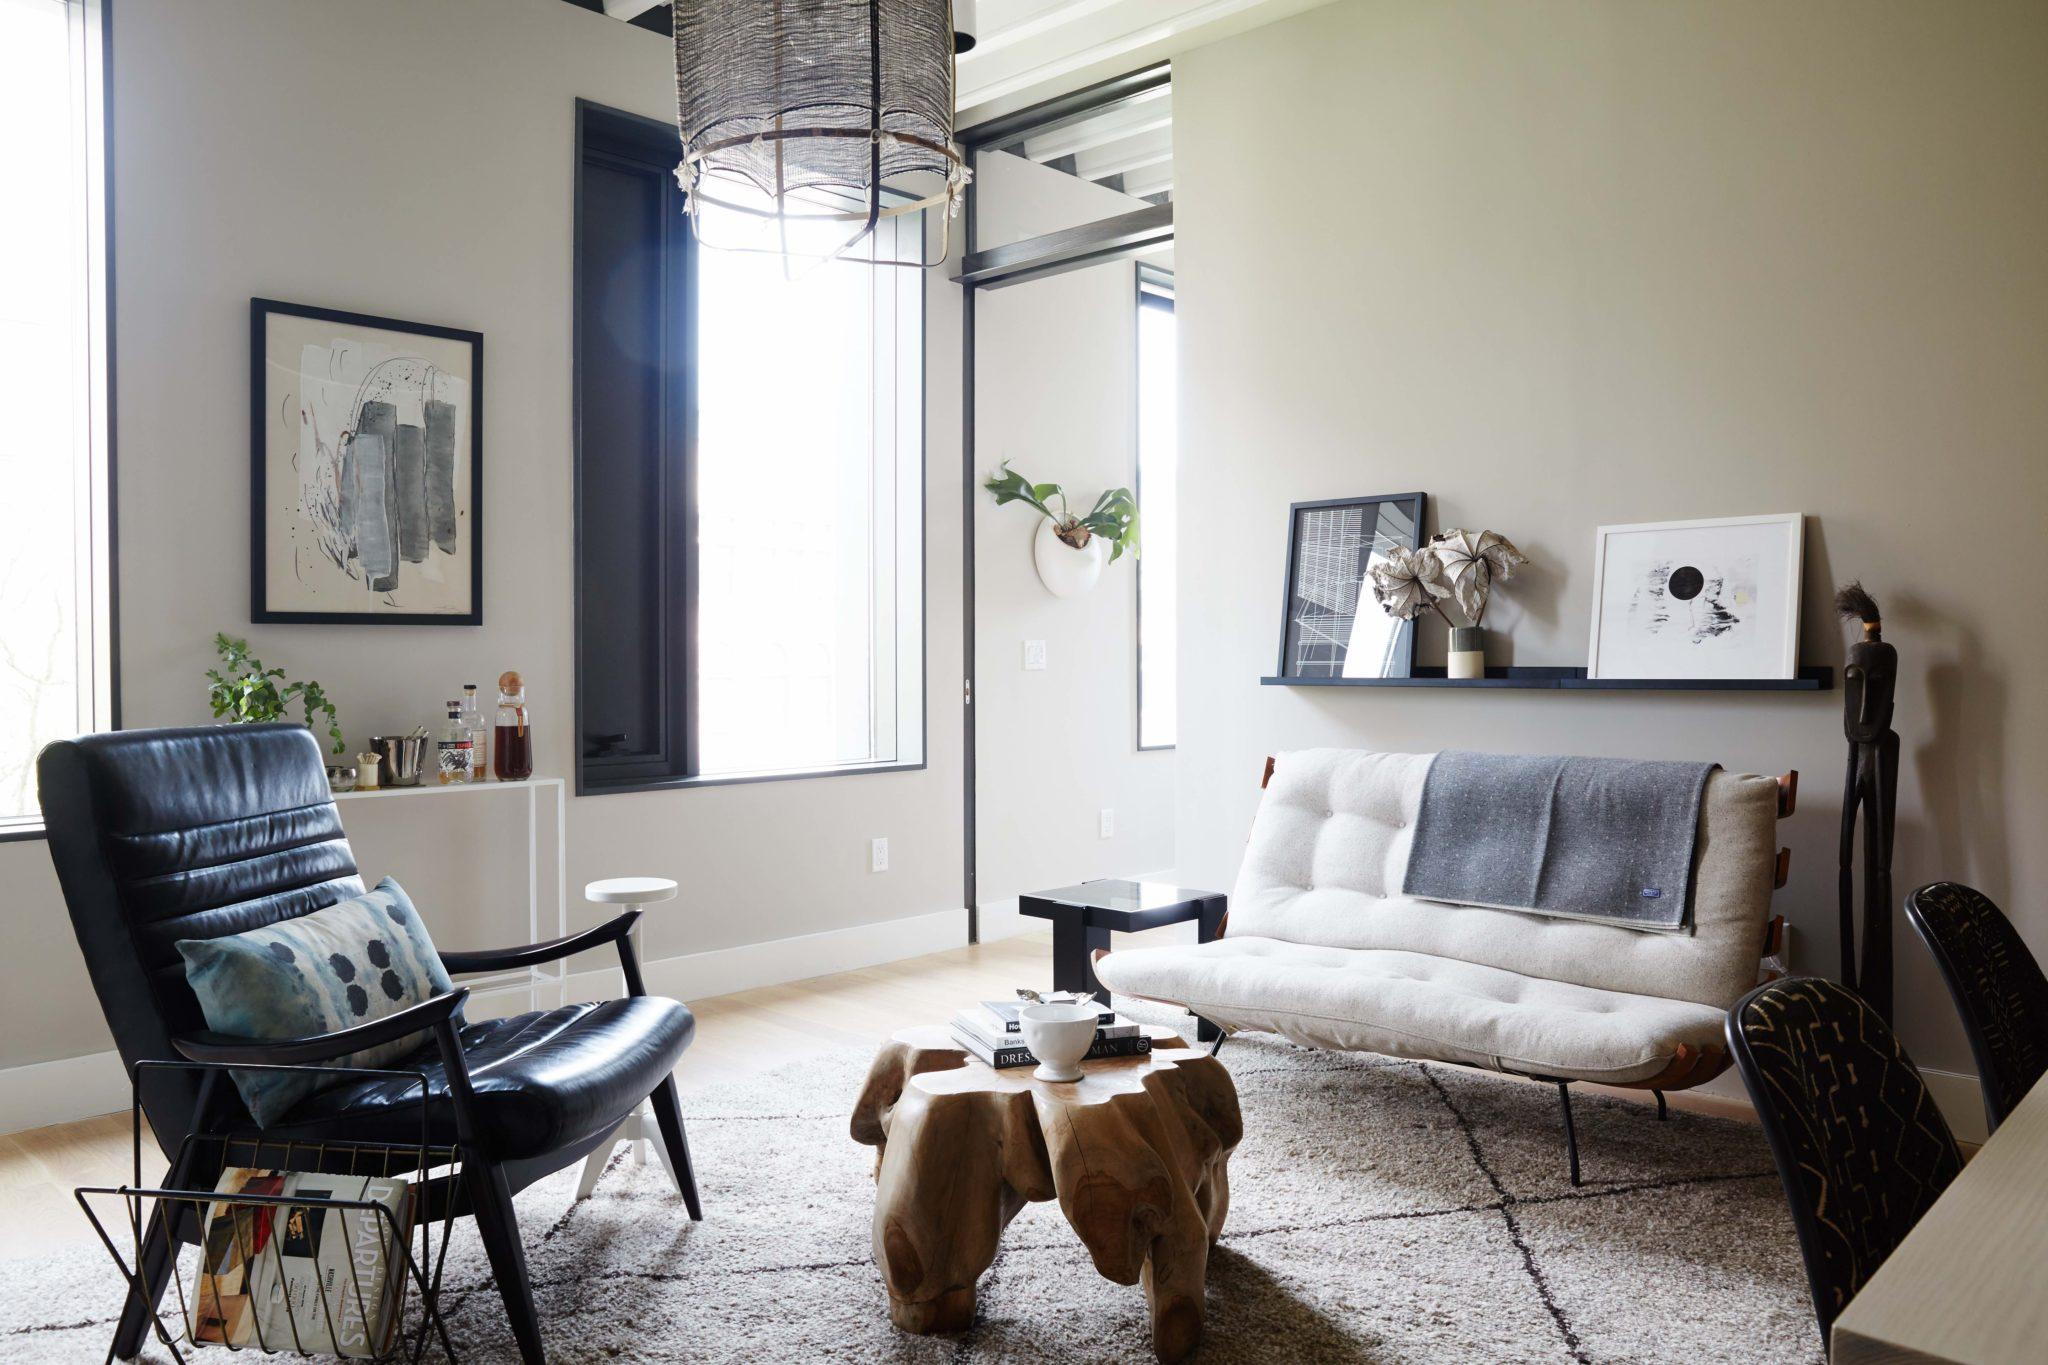 Interior design by sheep + stone